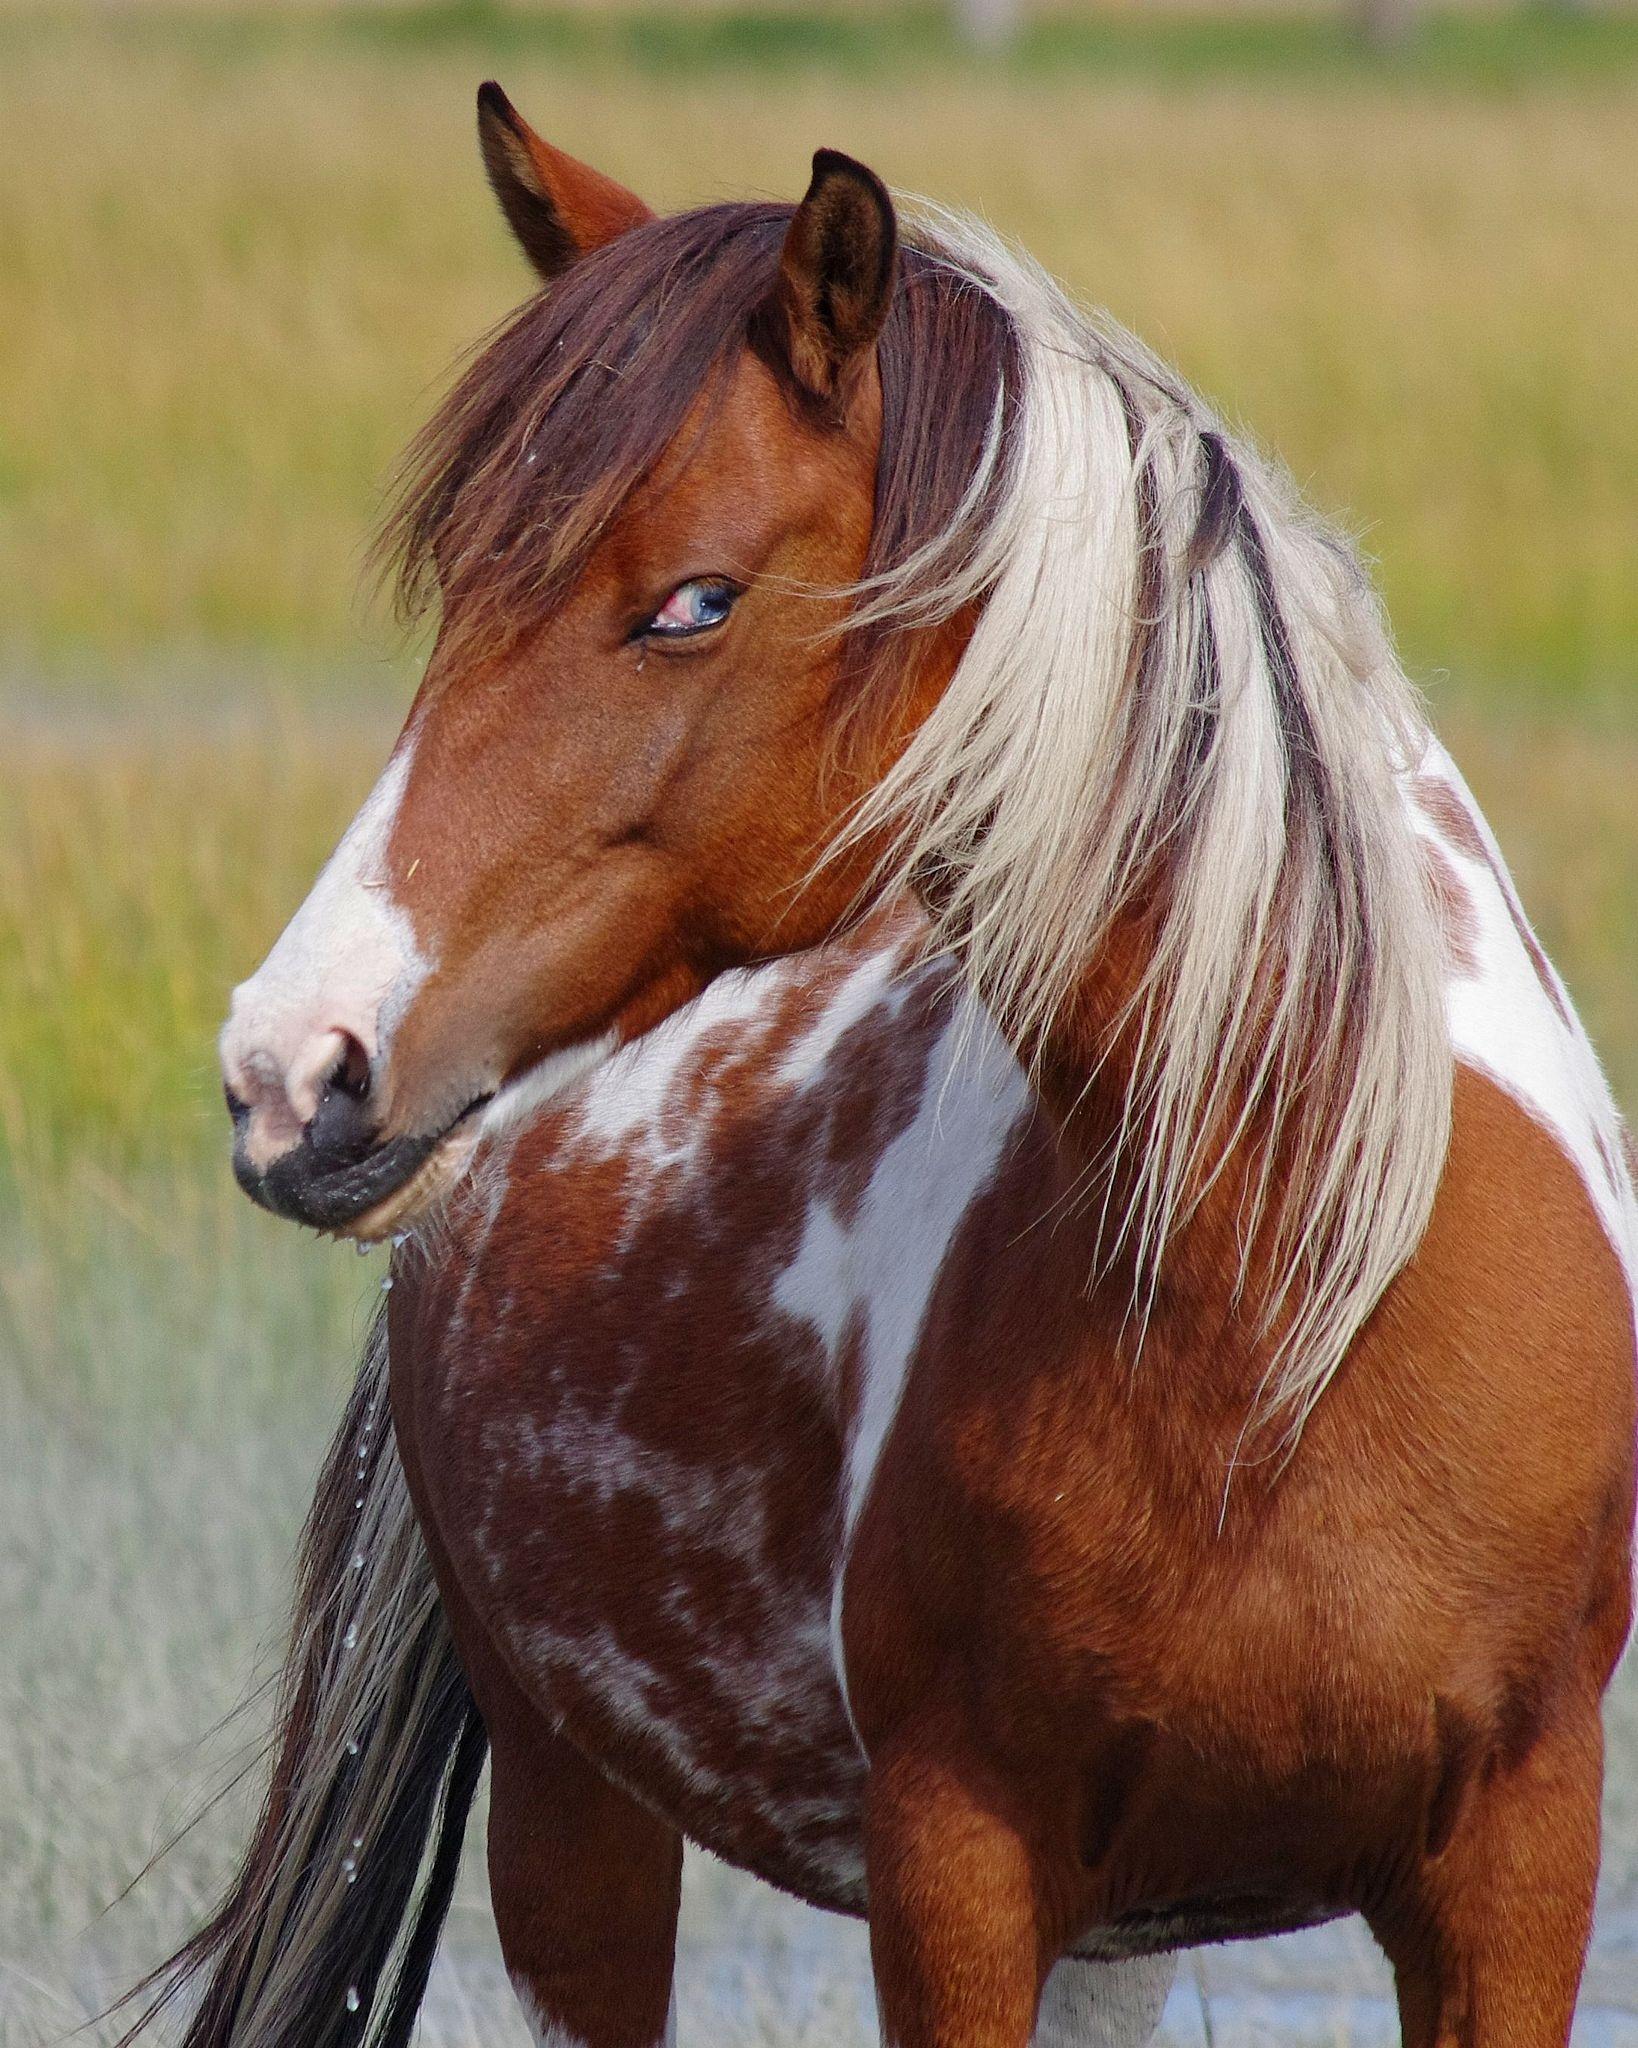 Wild Horses By Gary Schwartzwald On 500px